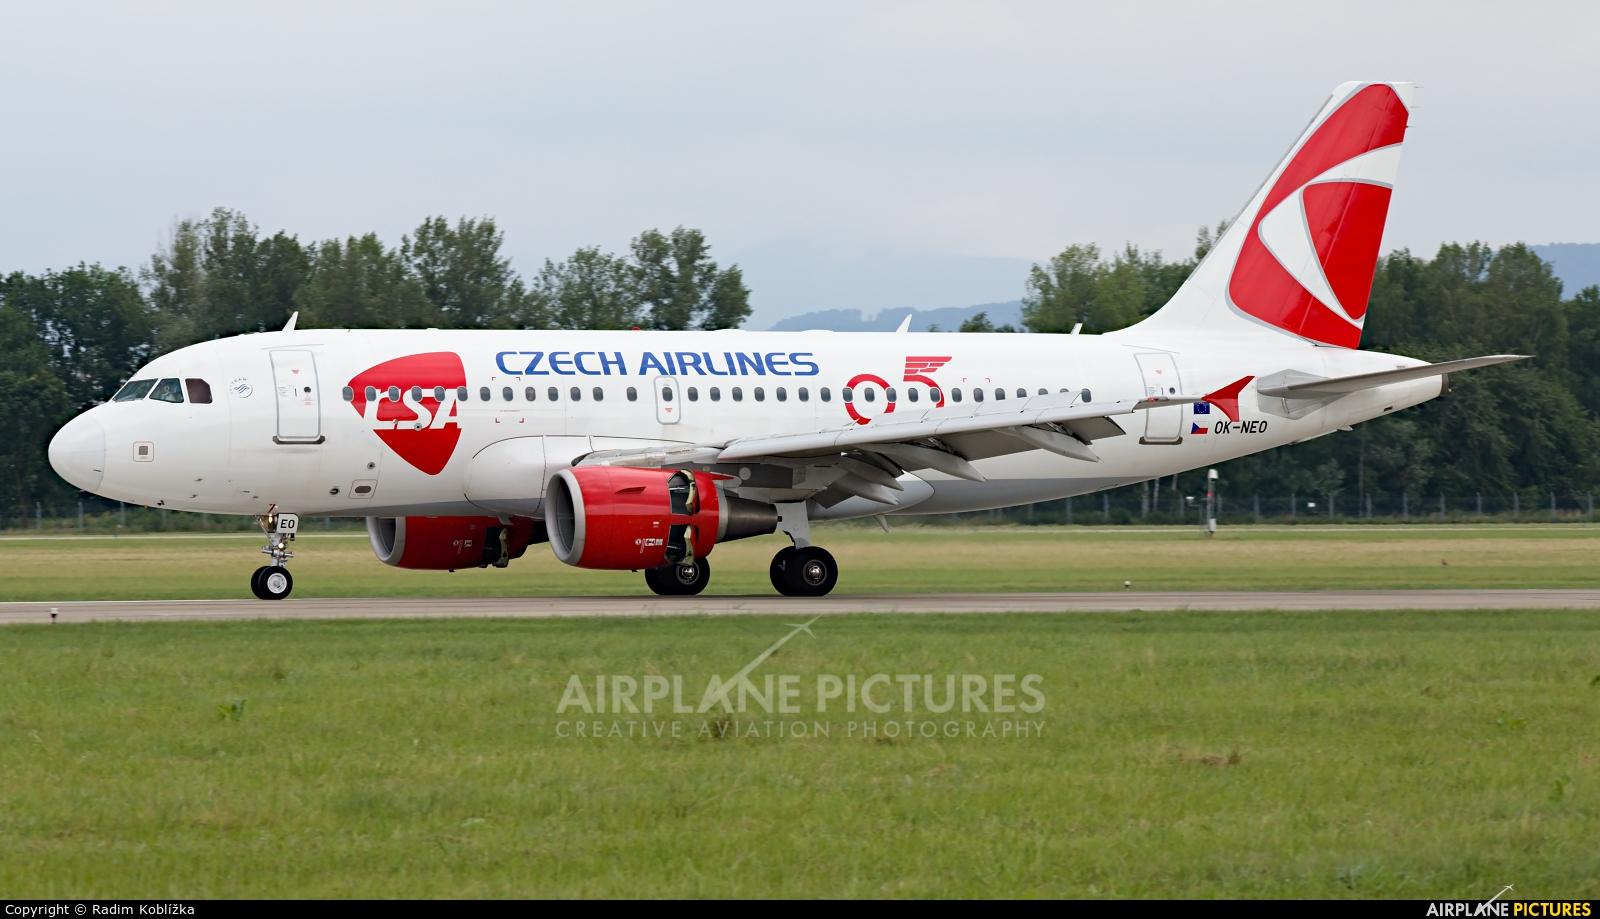 CSA - Czech Airlines OK-NEO aircraft at Ostrava Mošnov